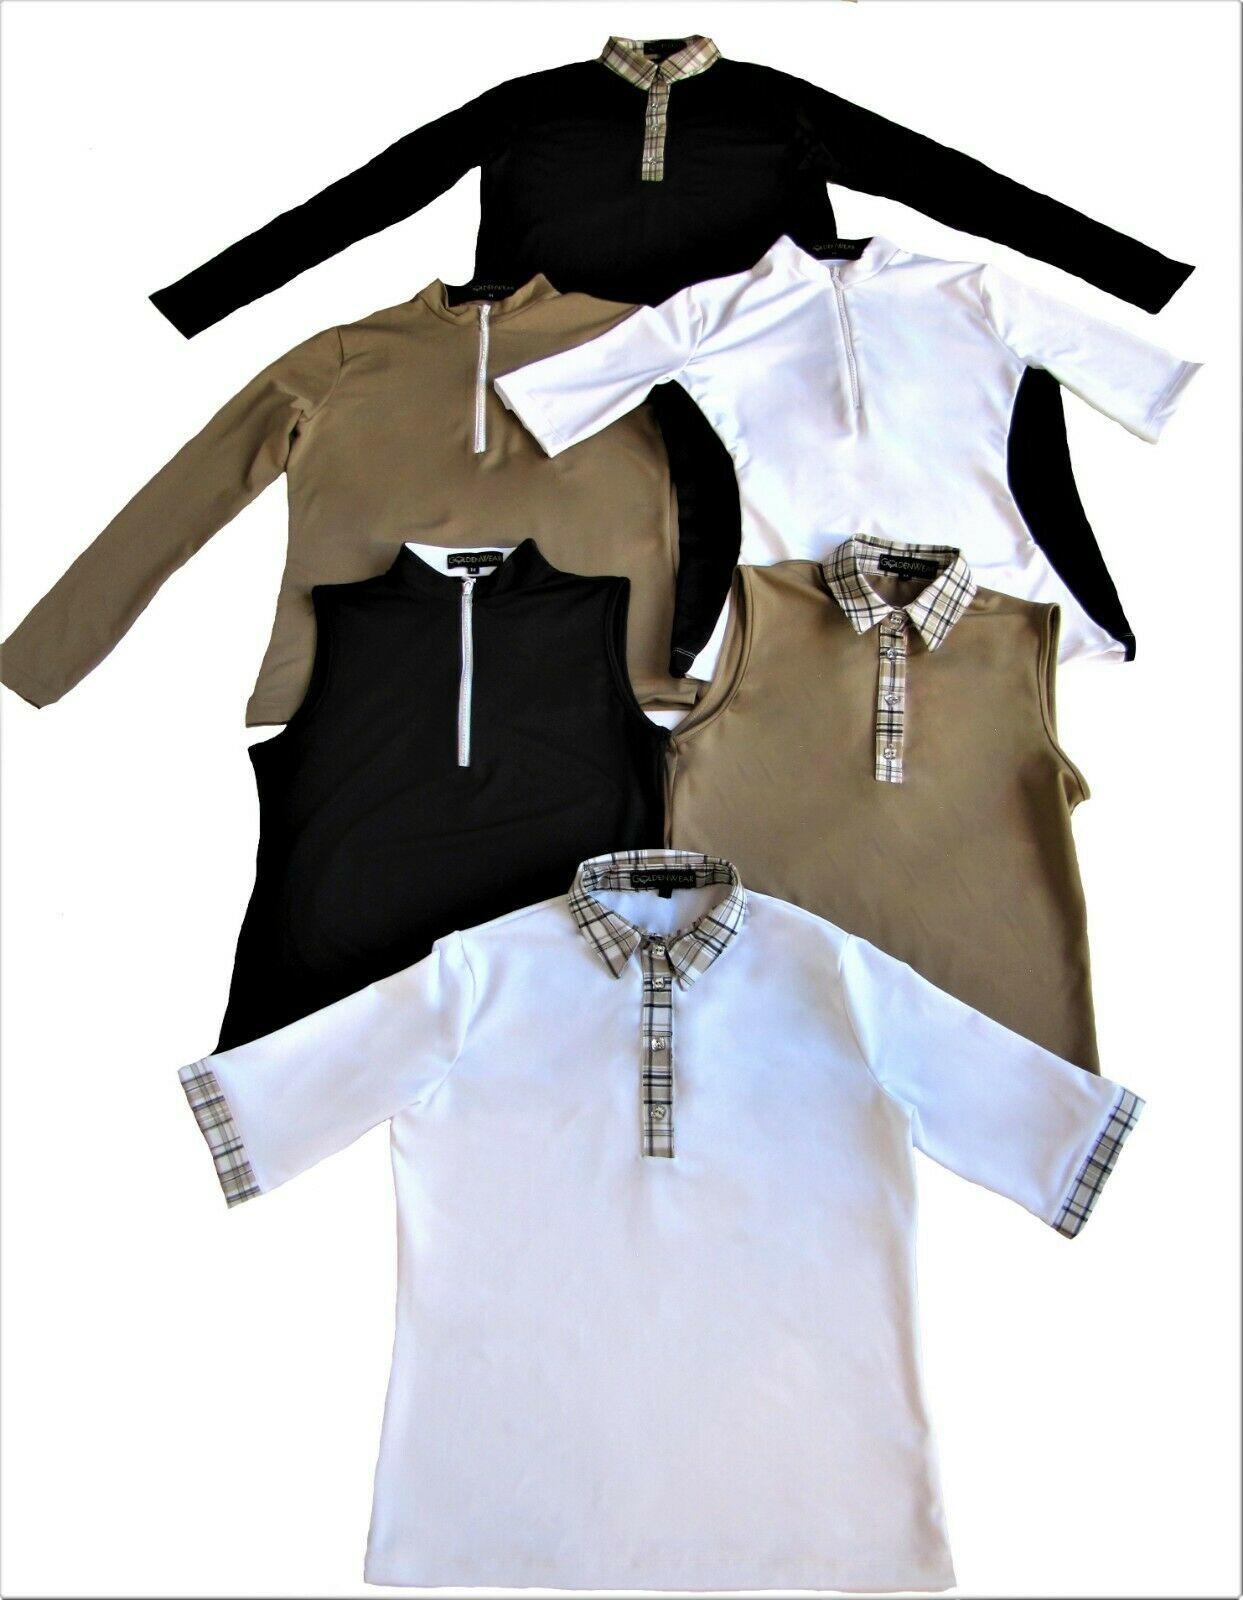 Stylish Women's Golf & Casual Sleeveless White Mock Polo, Rhinestone Zipper image 2